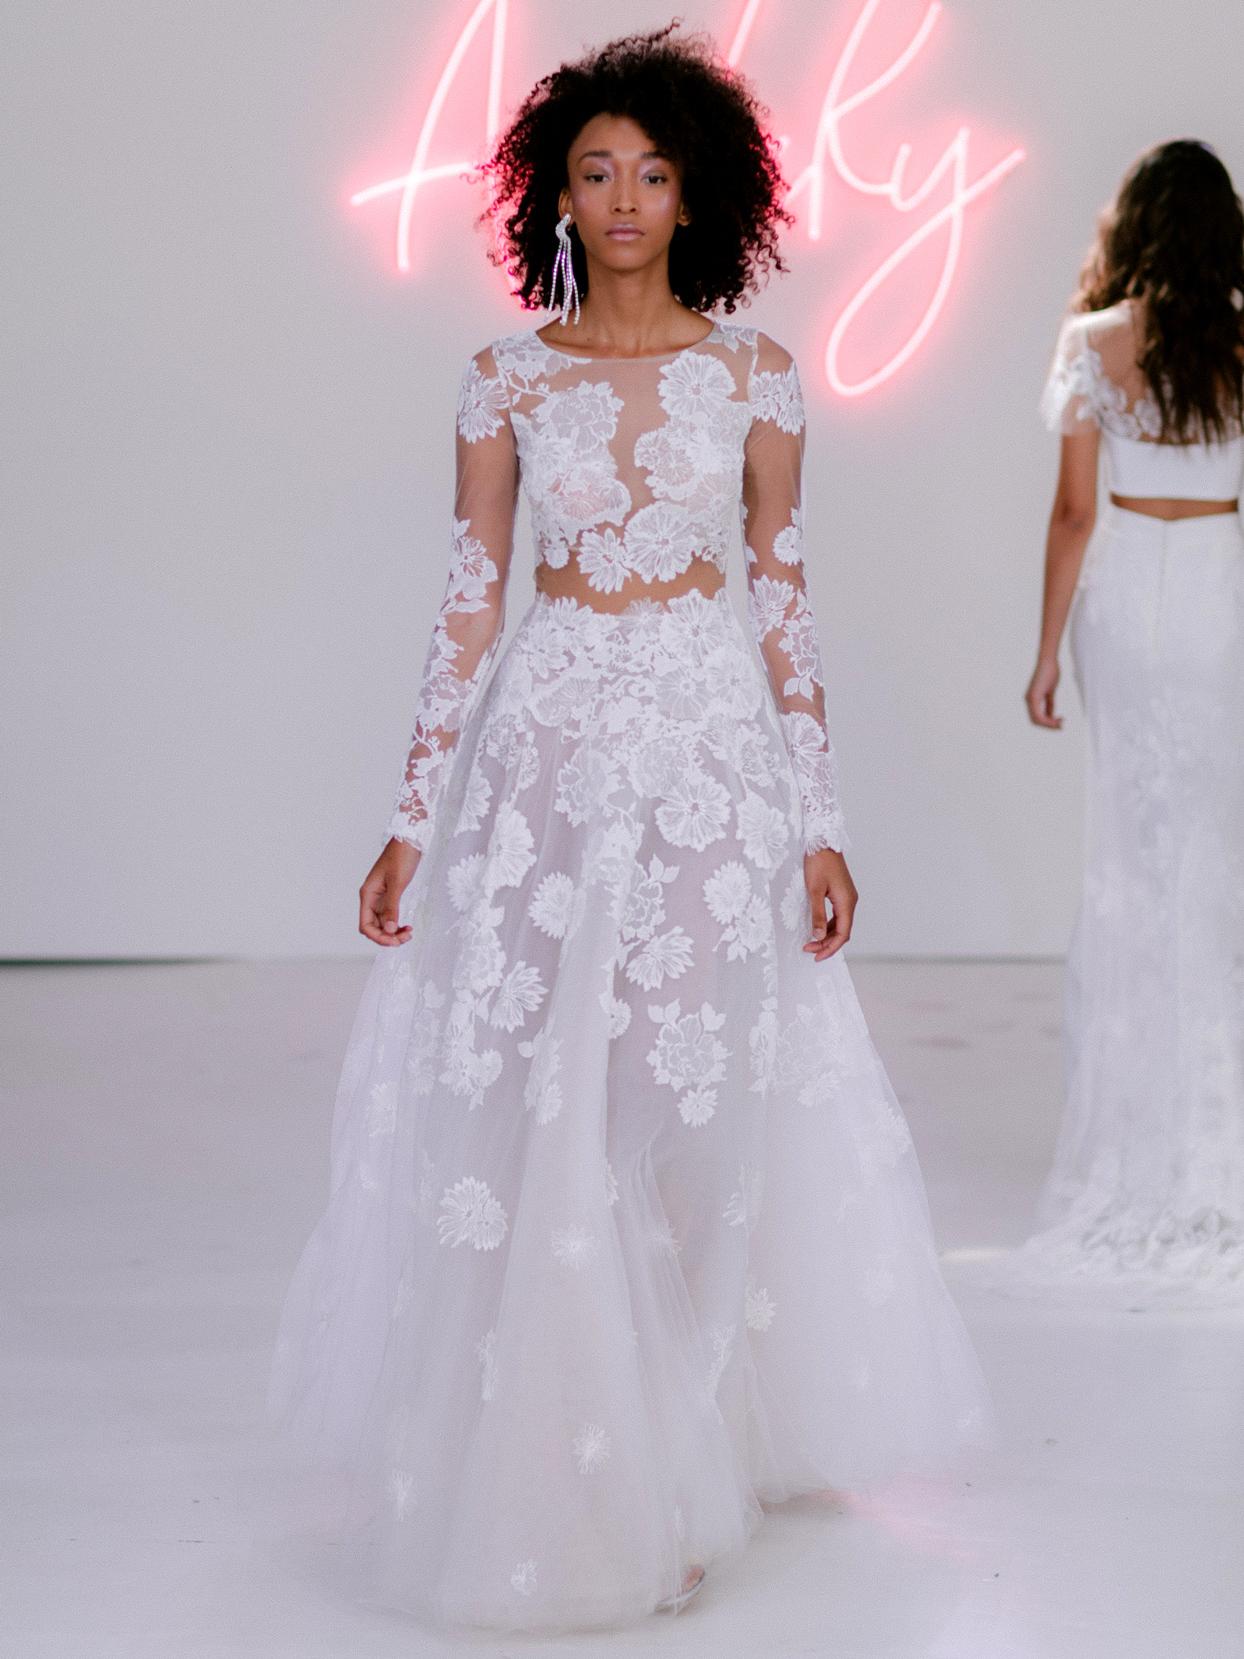 Rime Arodaky X The Mews Bridal sheer lace long sleeve crew neck wedding dress fall 2020